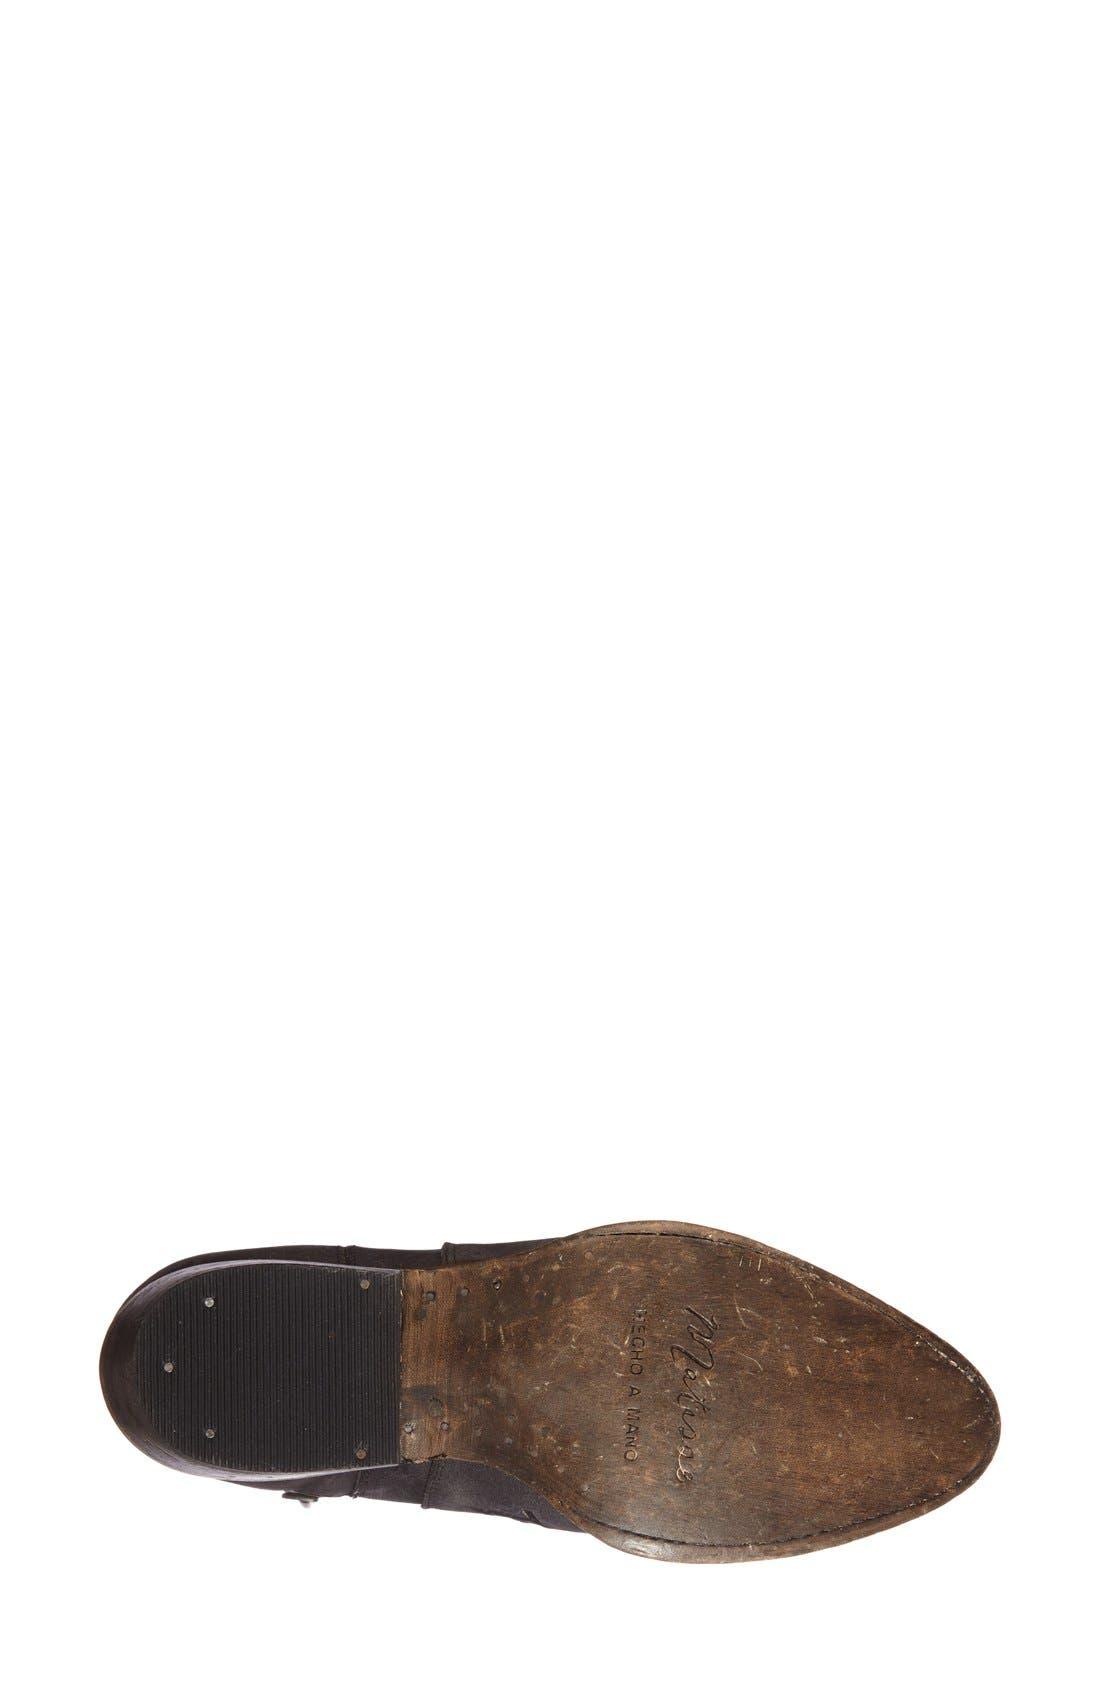 Alternate Image 2  - Matisse 'Remington' Western Boot (Women)